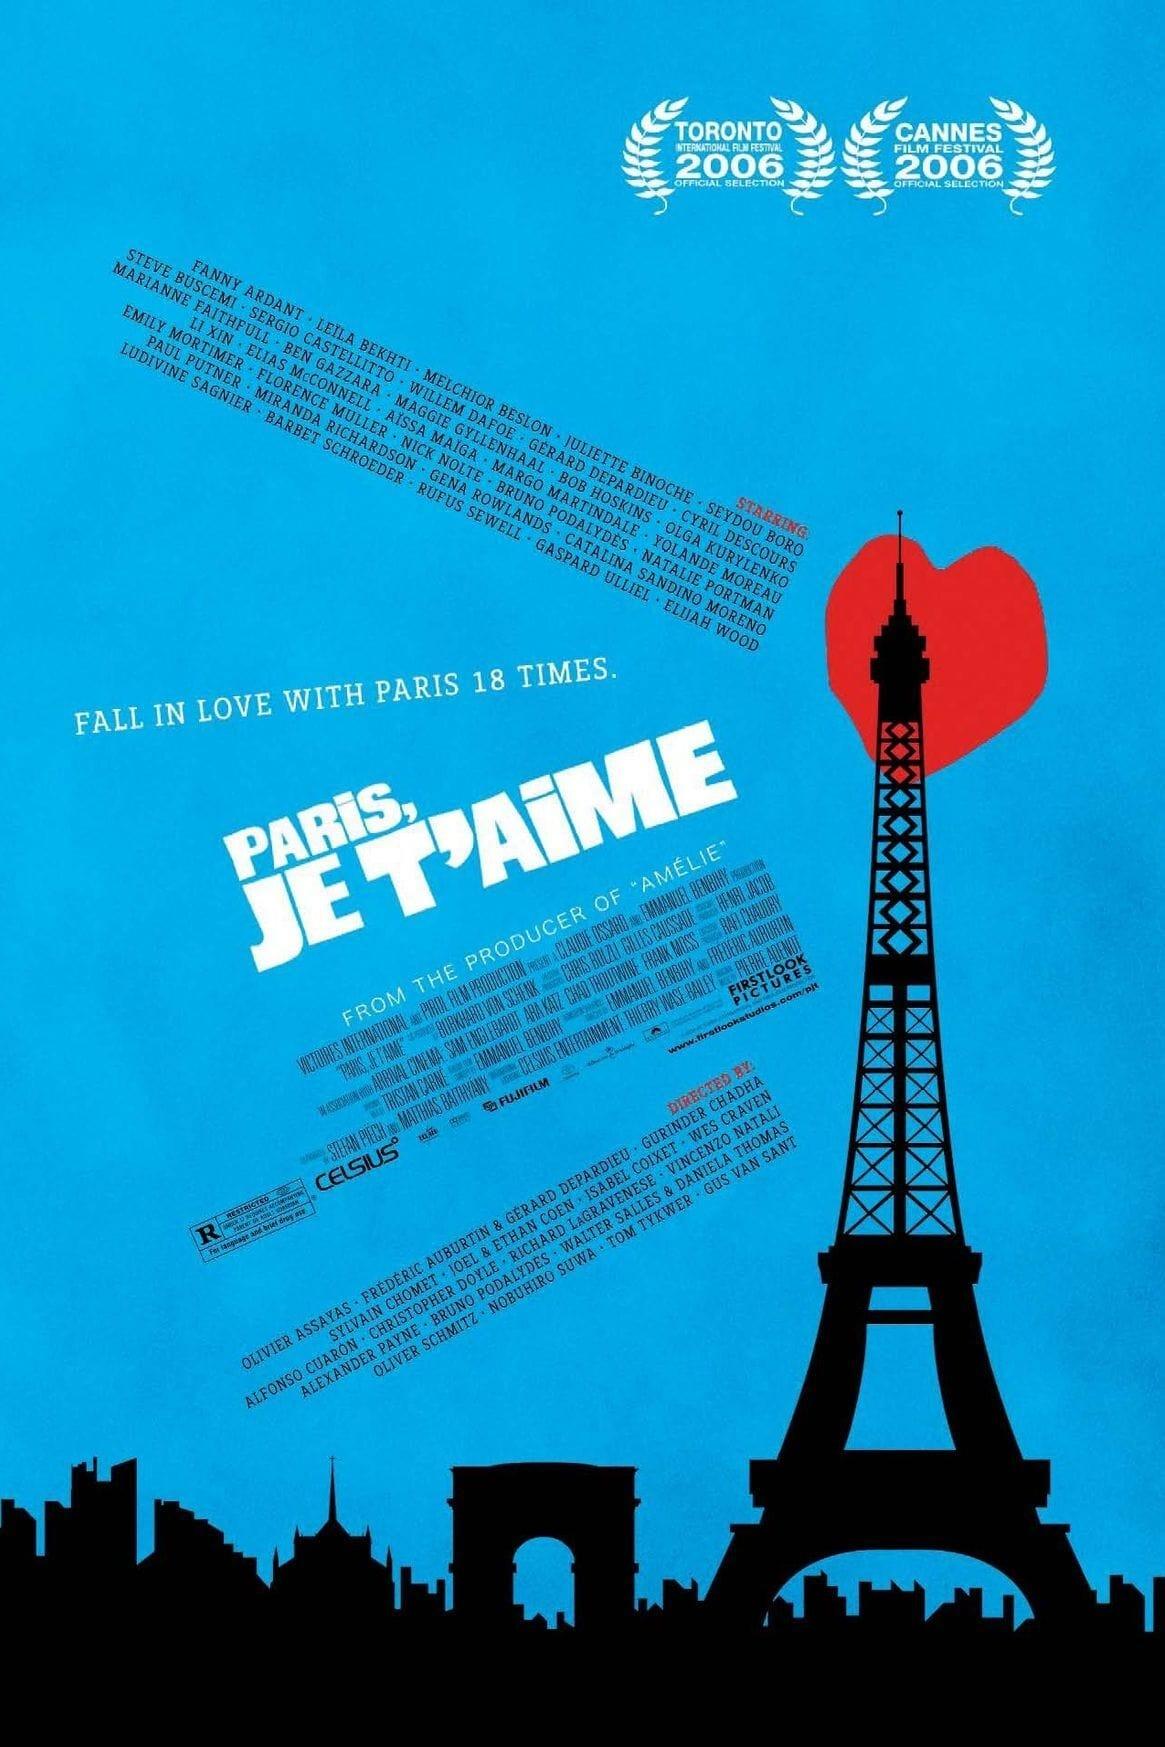 París, je t'aime